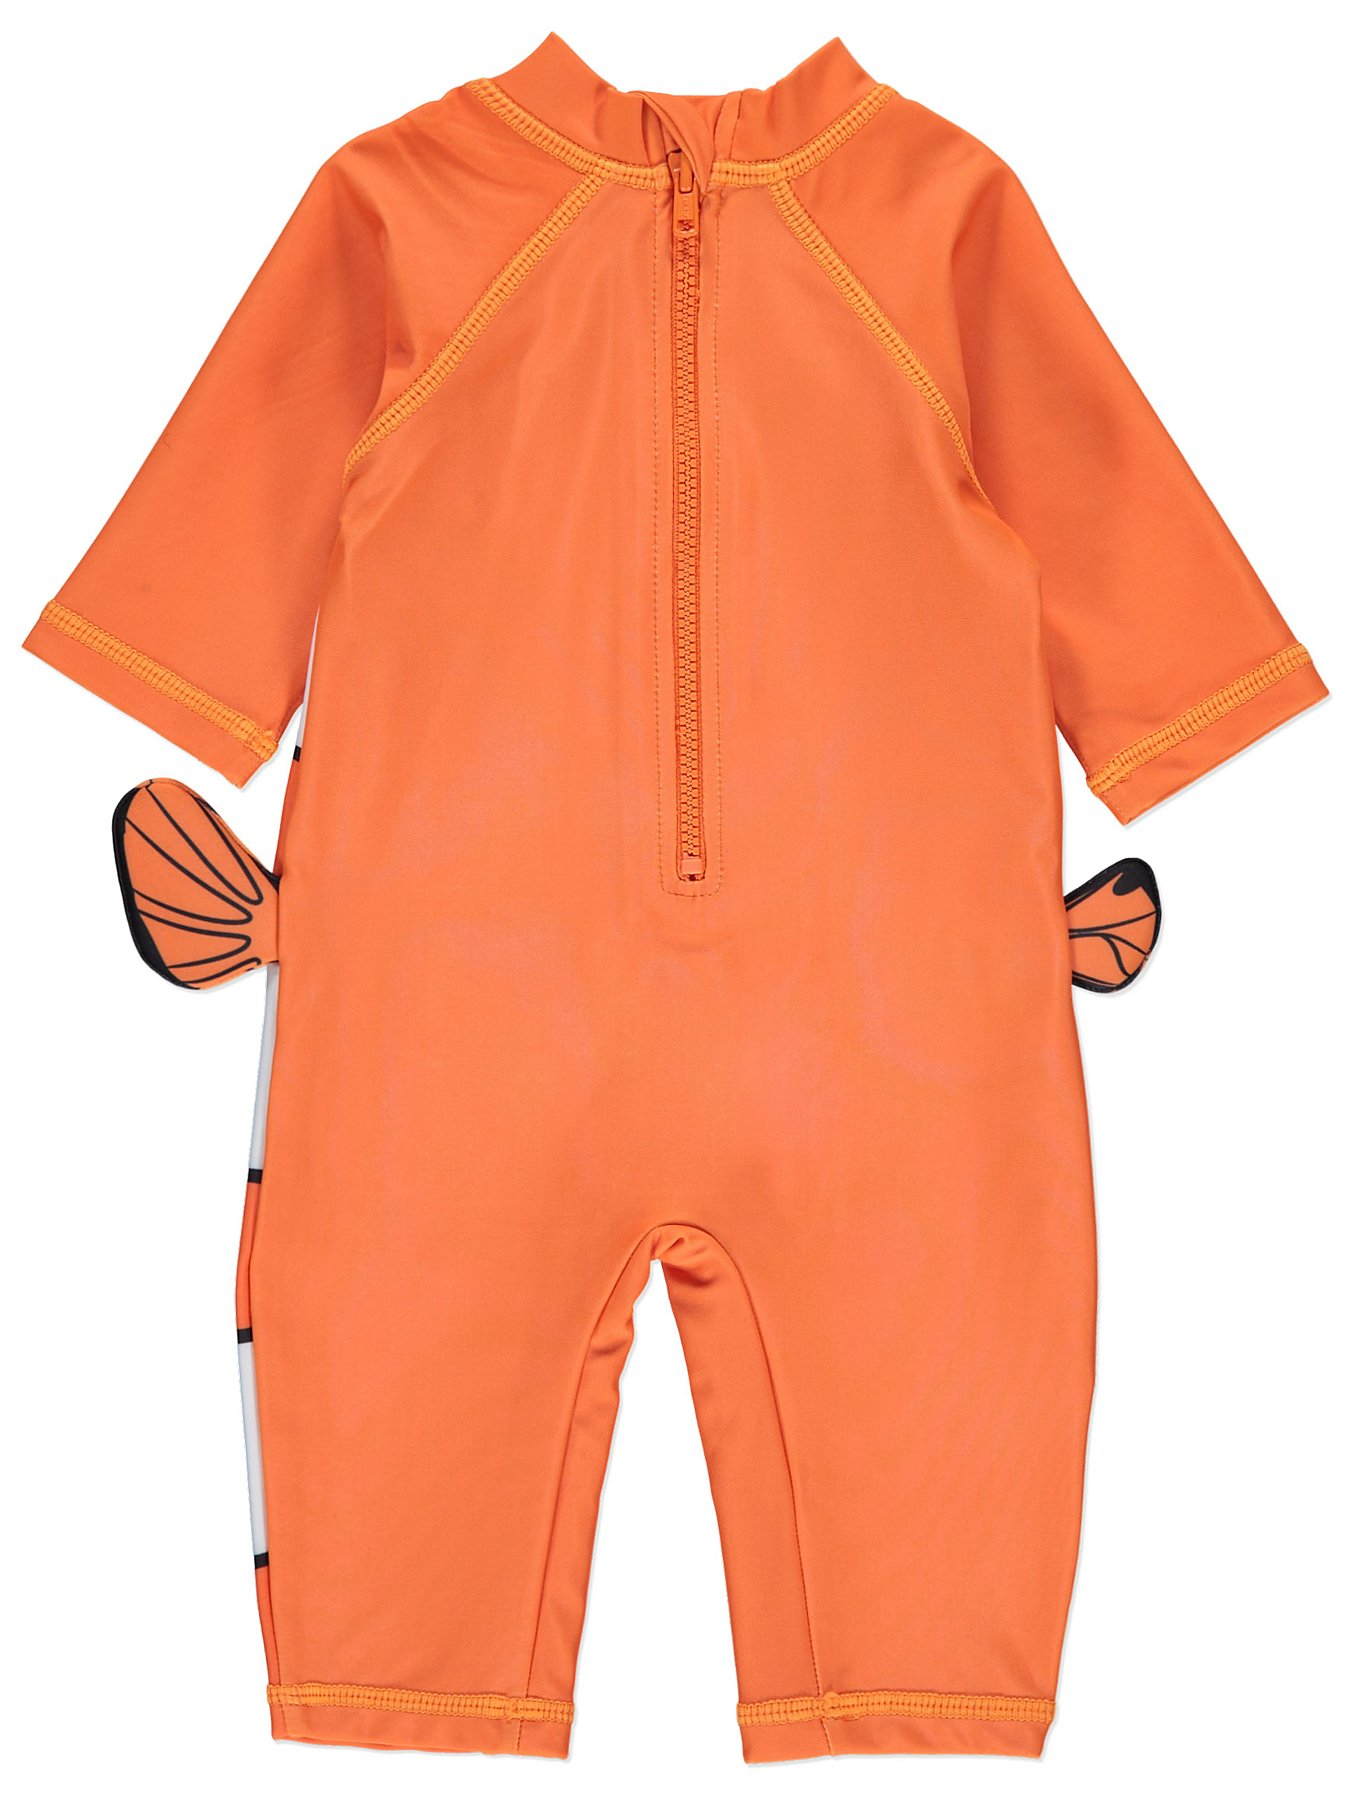 e1e117de6f Disney Finding Nemo Sun Protection UV40 Swimsuit and Hat Set | Baby ...